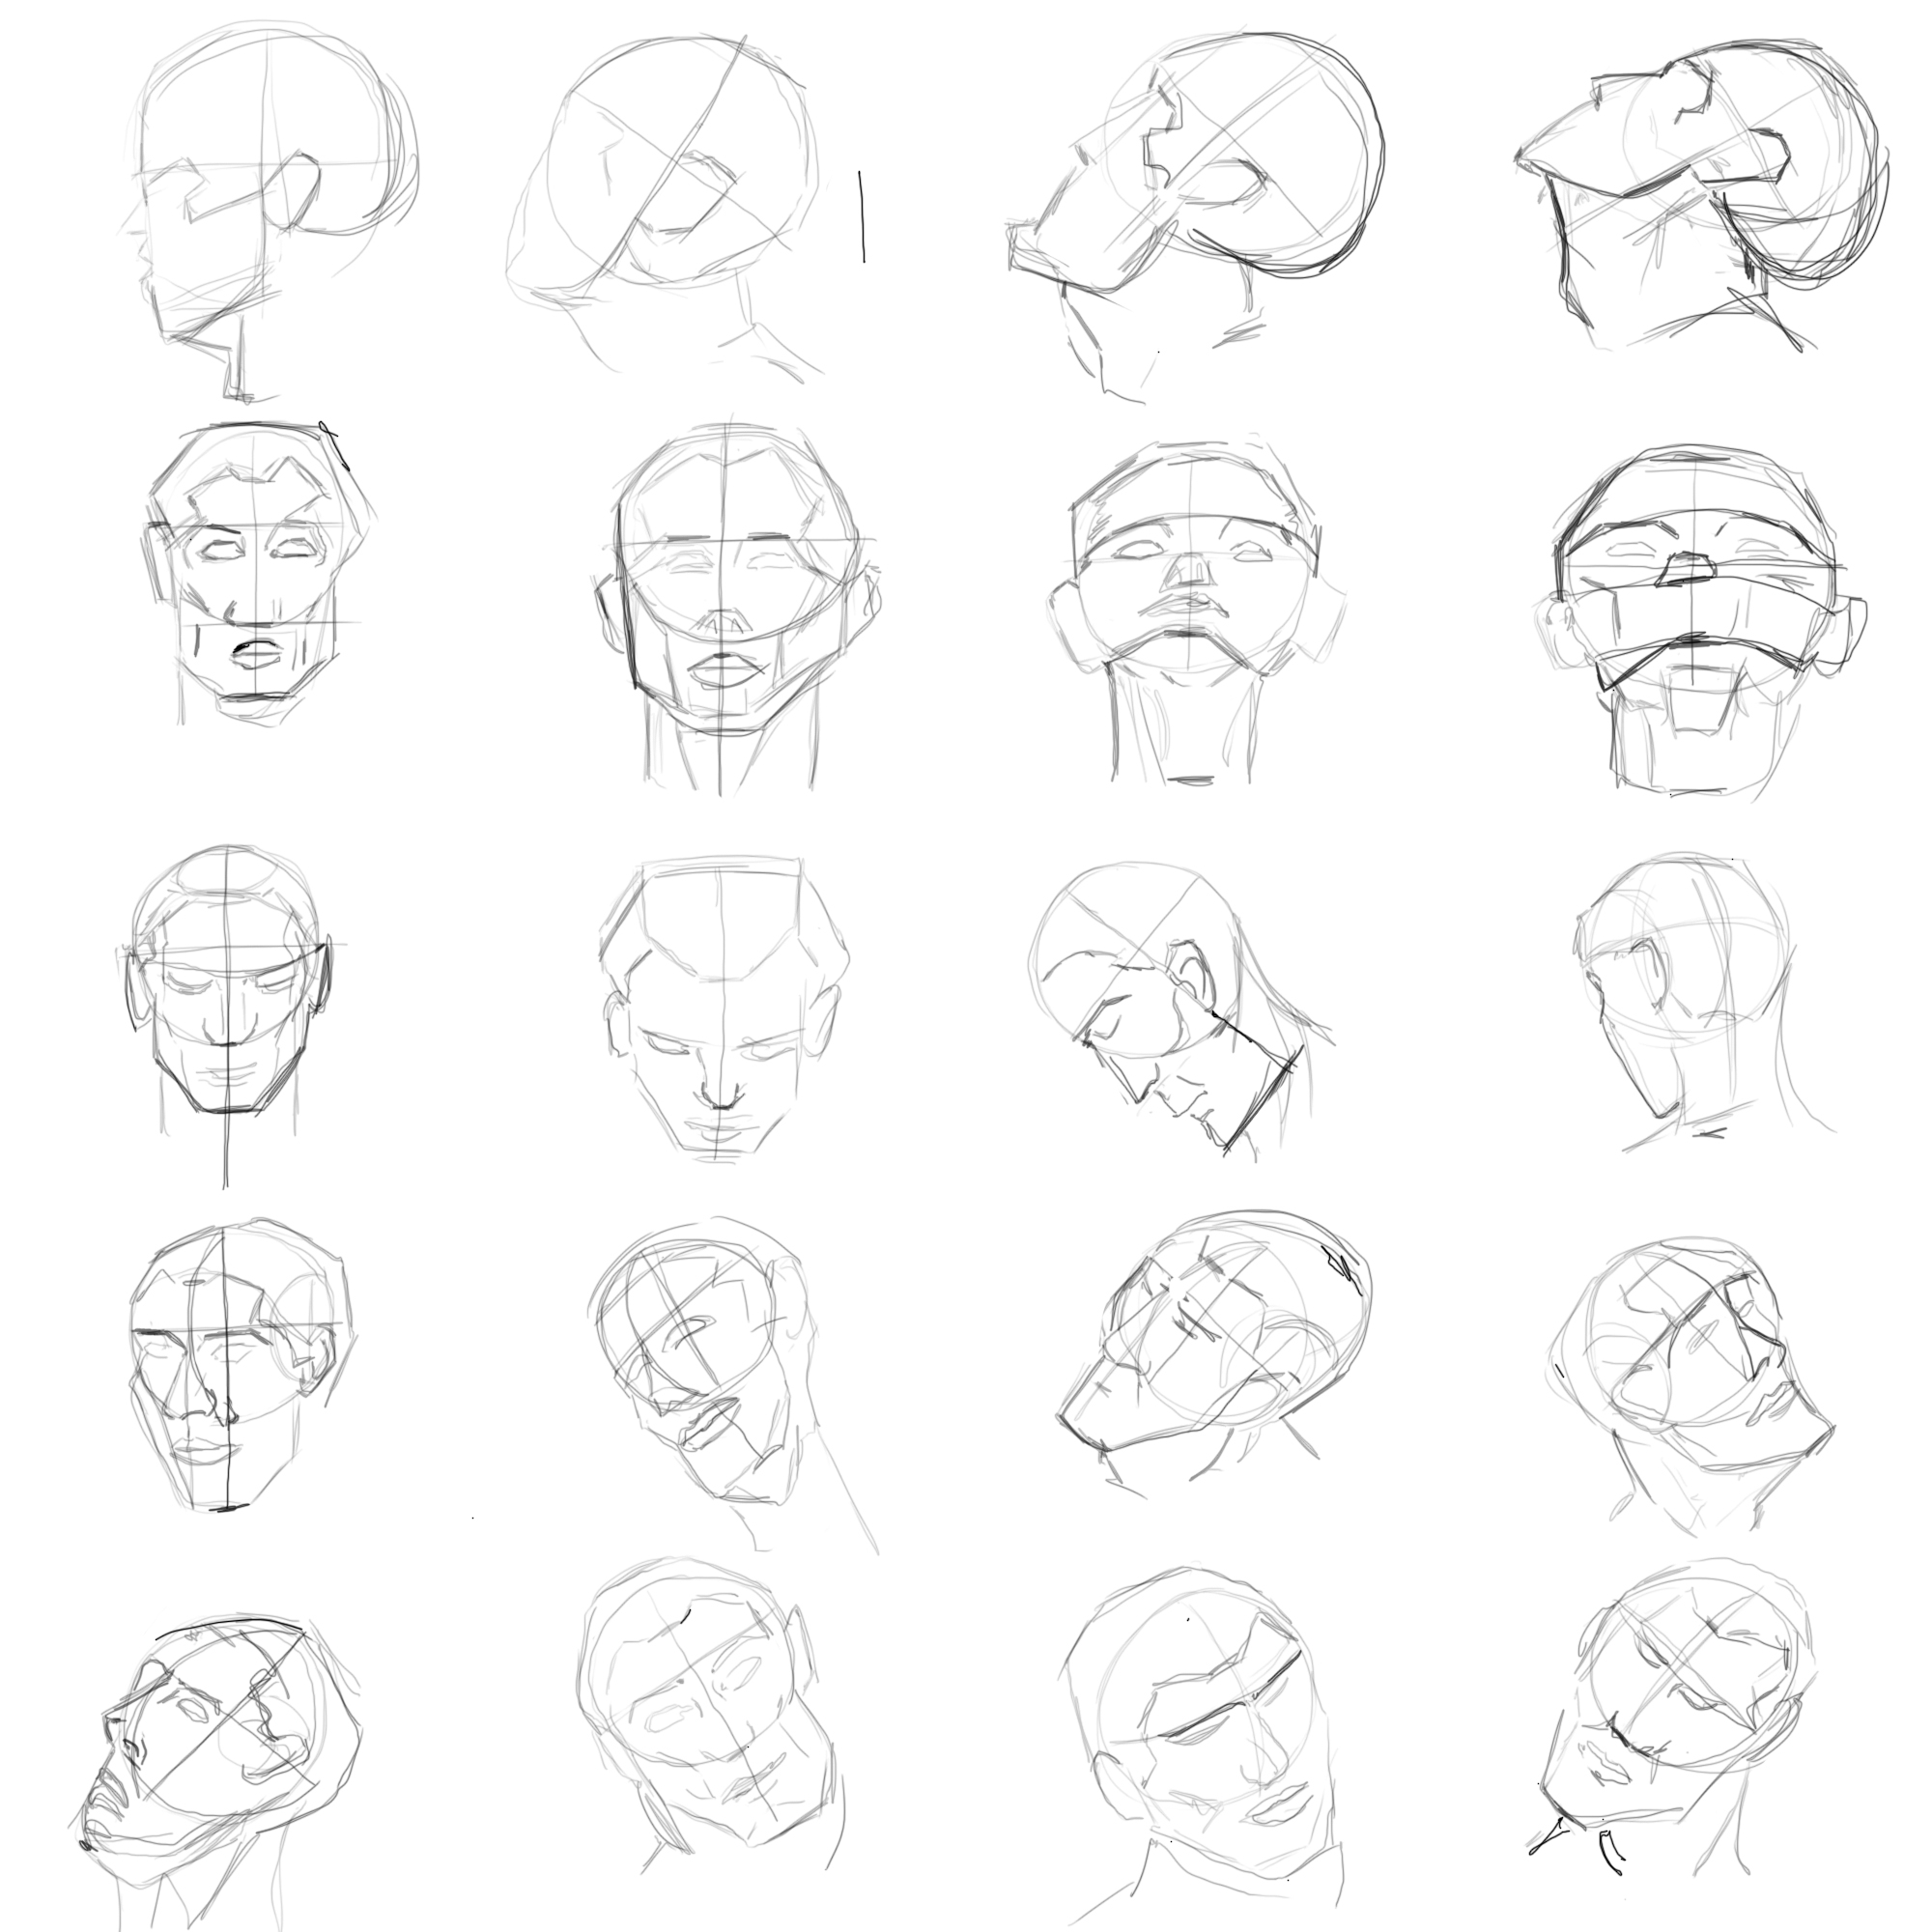 2000x2000 Human Head Drawing